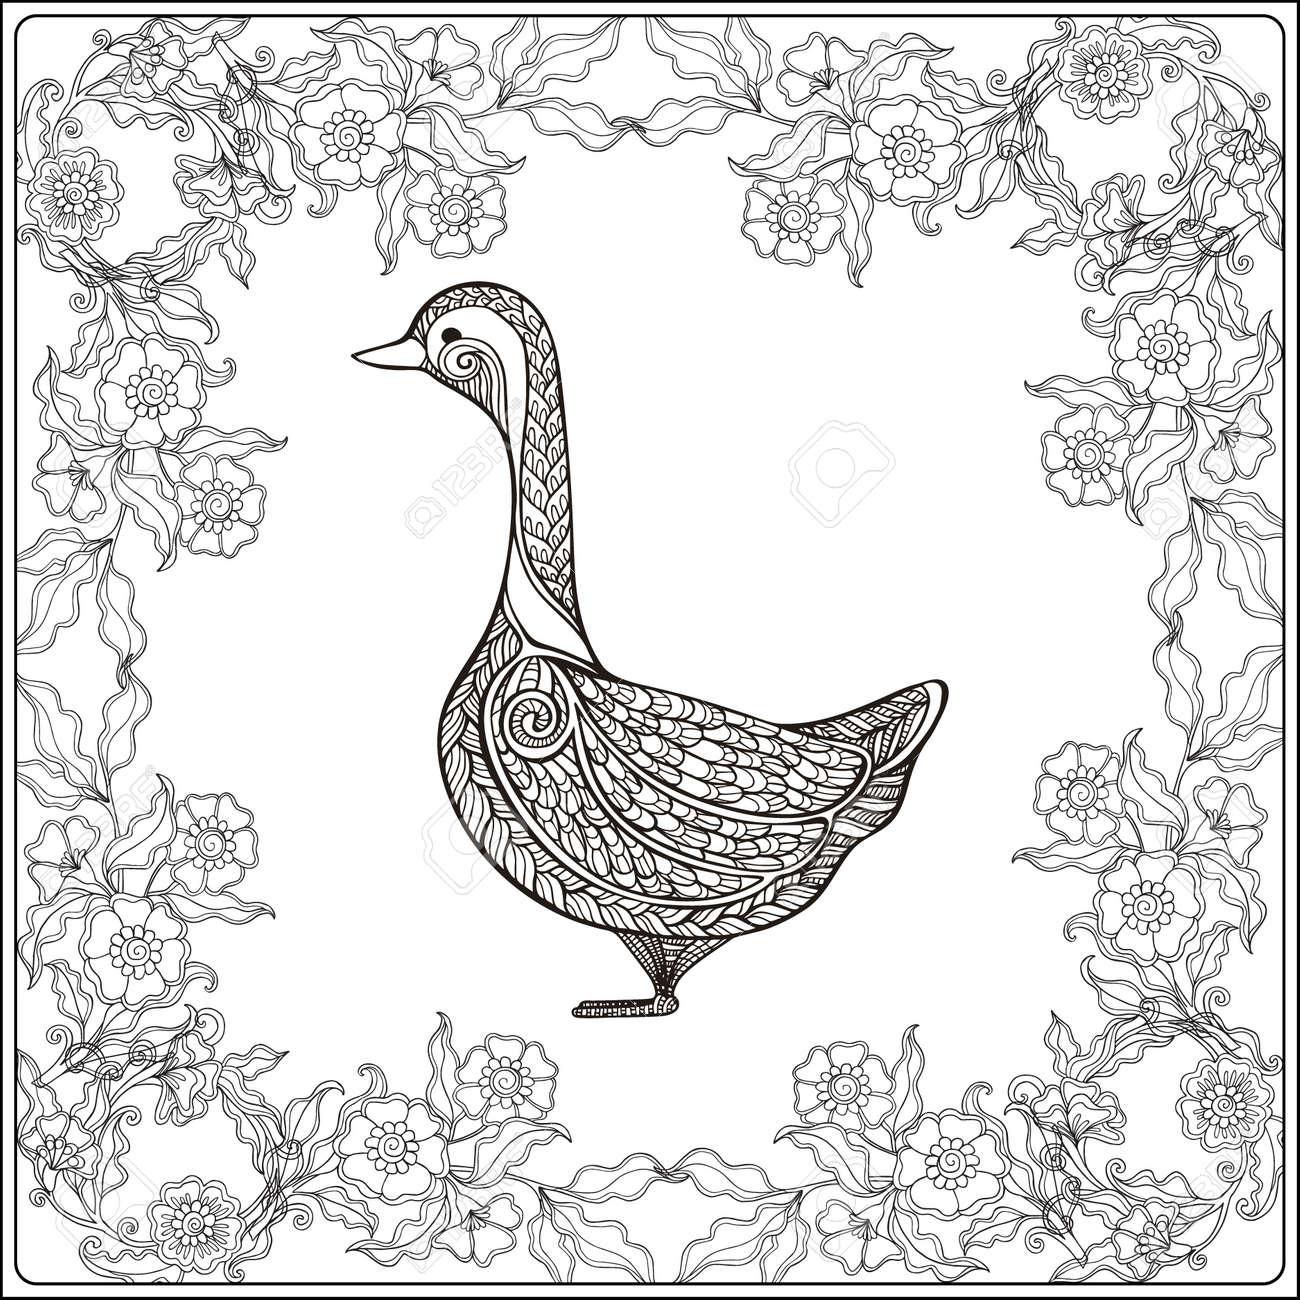 Goose in floral frame. Coloring book for adult and older children...